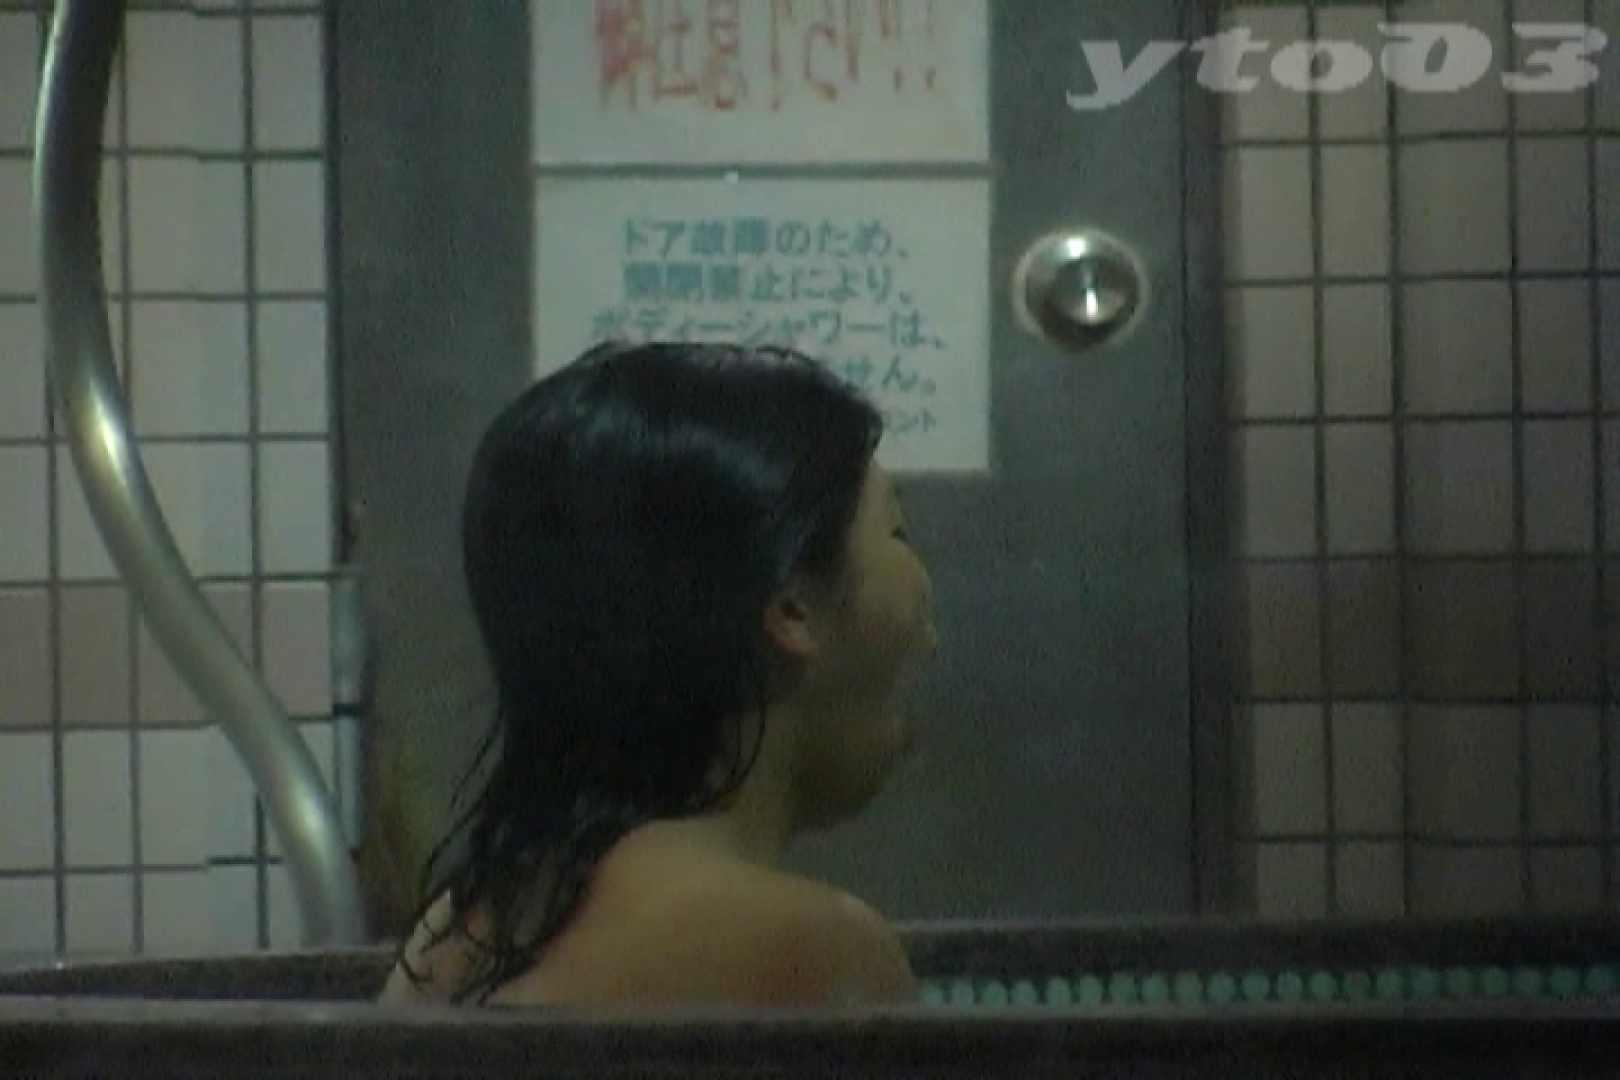 ▲復活限定▲合宿ホテル女風呂盗撮 Vol.17 合宿中の出来事   名作 盗撮 100画像 97